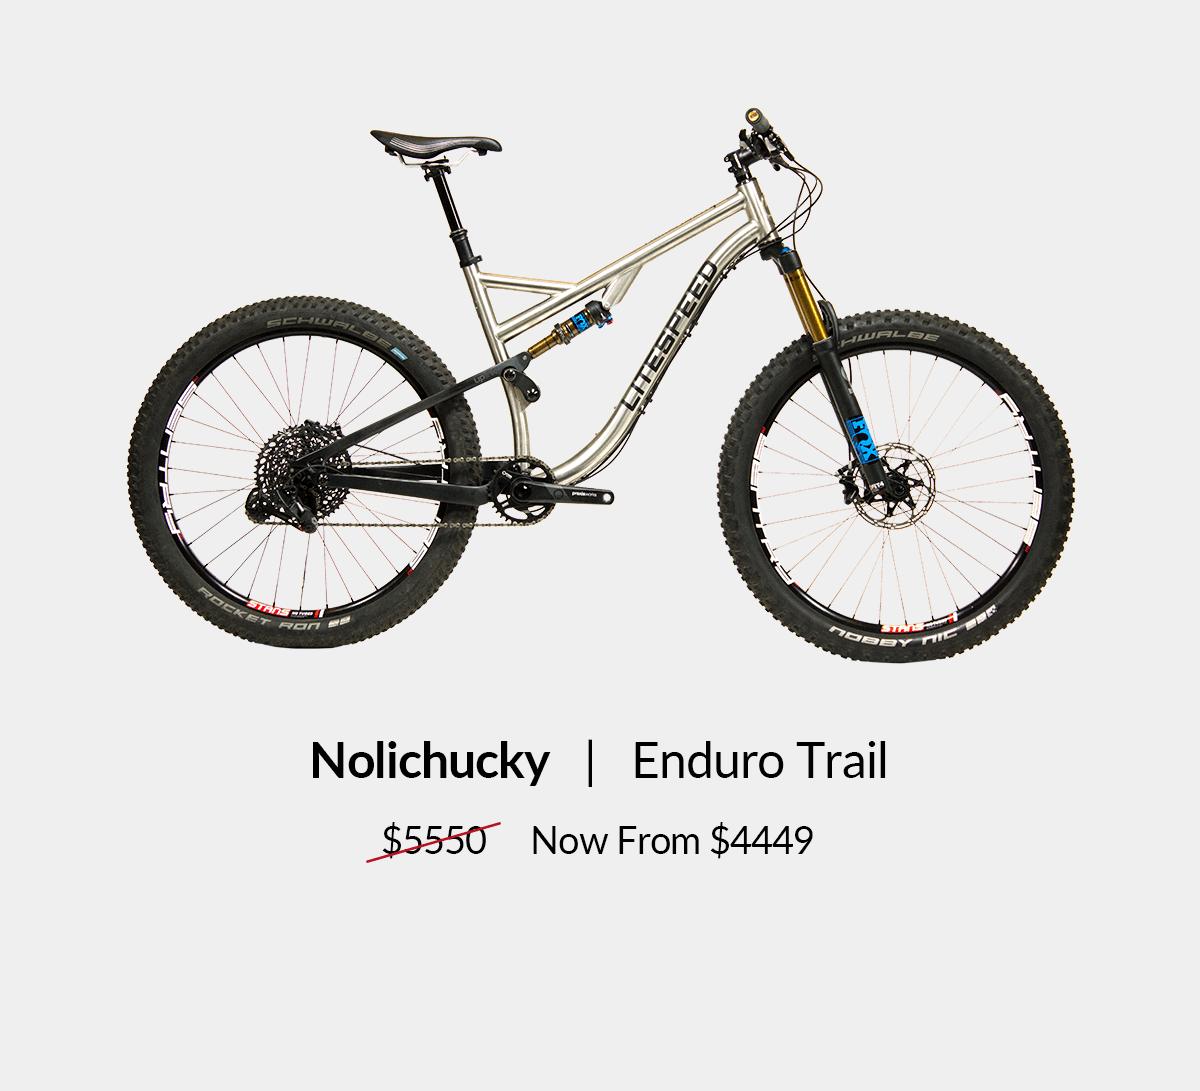 Nolichucky: Enduro trail bike from $4449. Shop now!